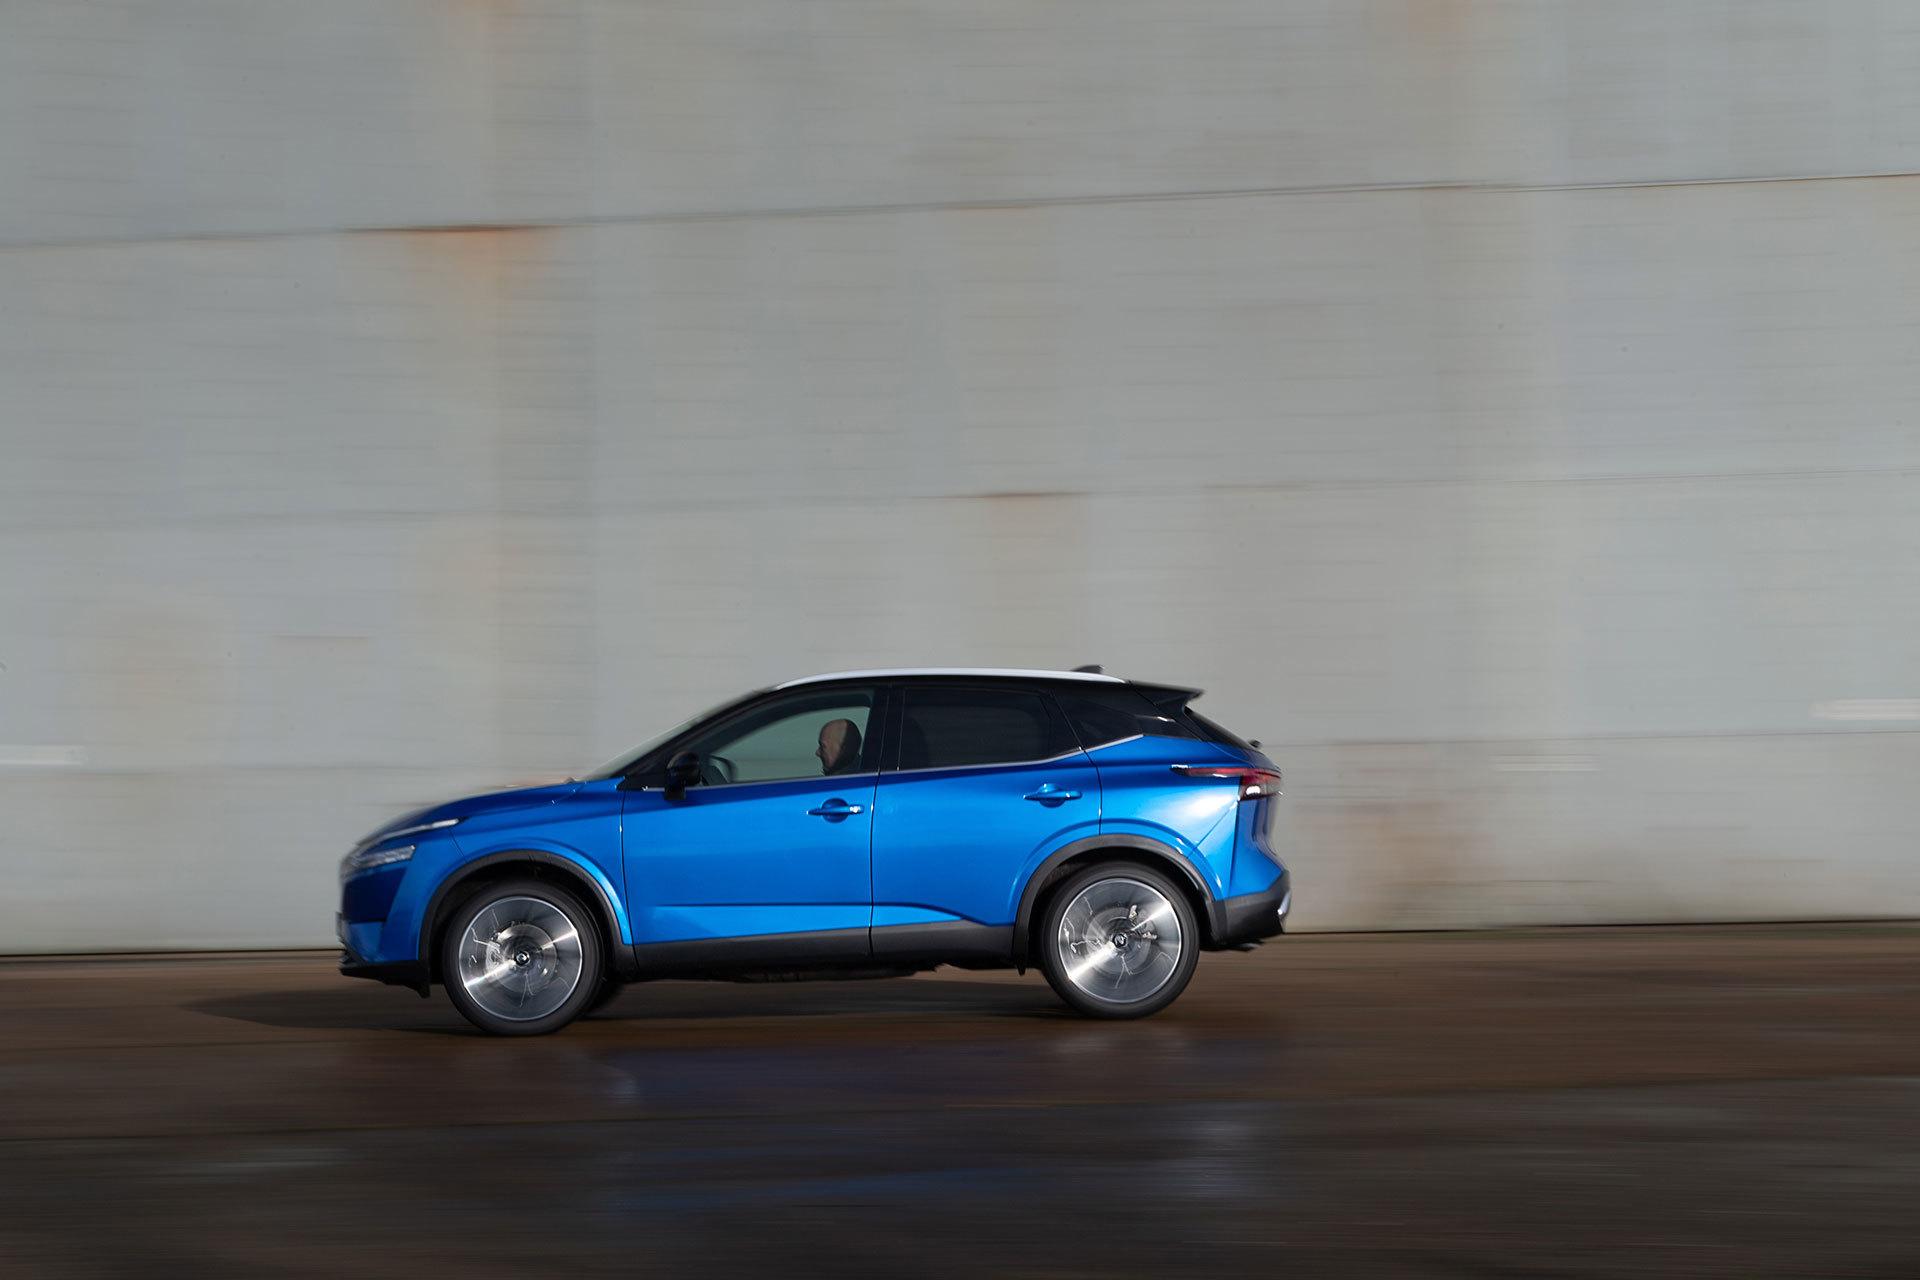 Nissan Qashqai 2021 Exterior Azul 33